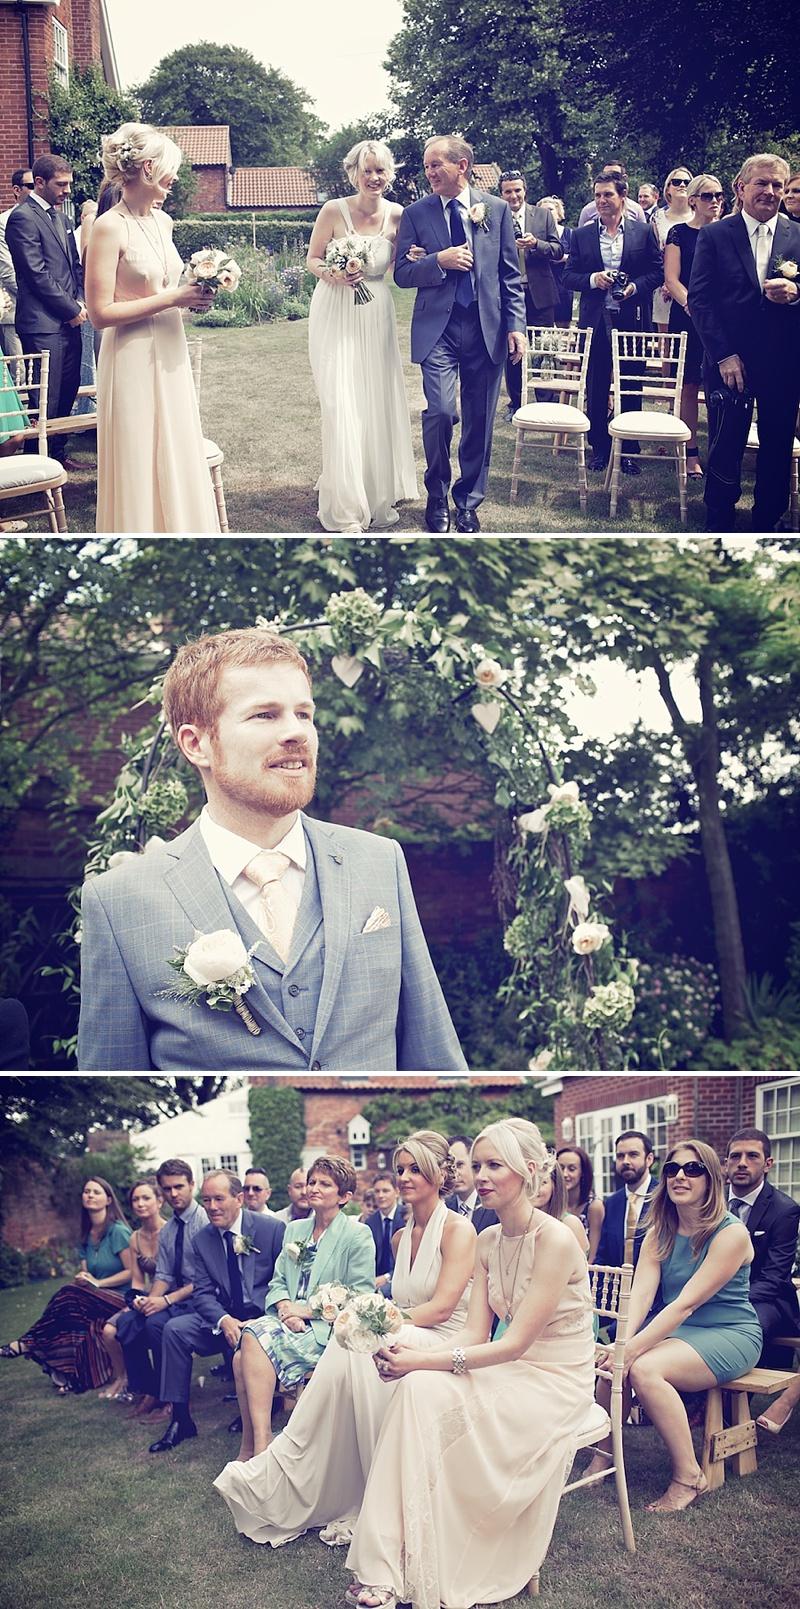 An english country backgarden humanist wedding with Biba dress tipi reception_0008